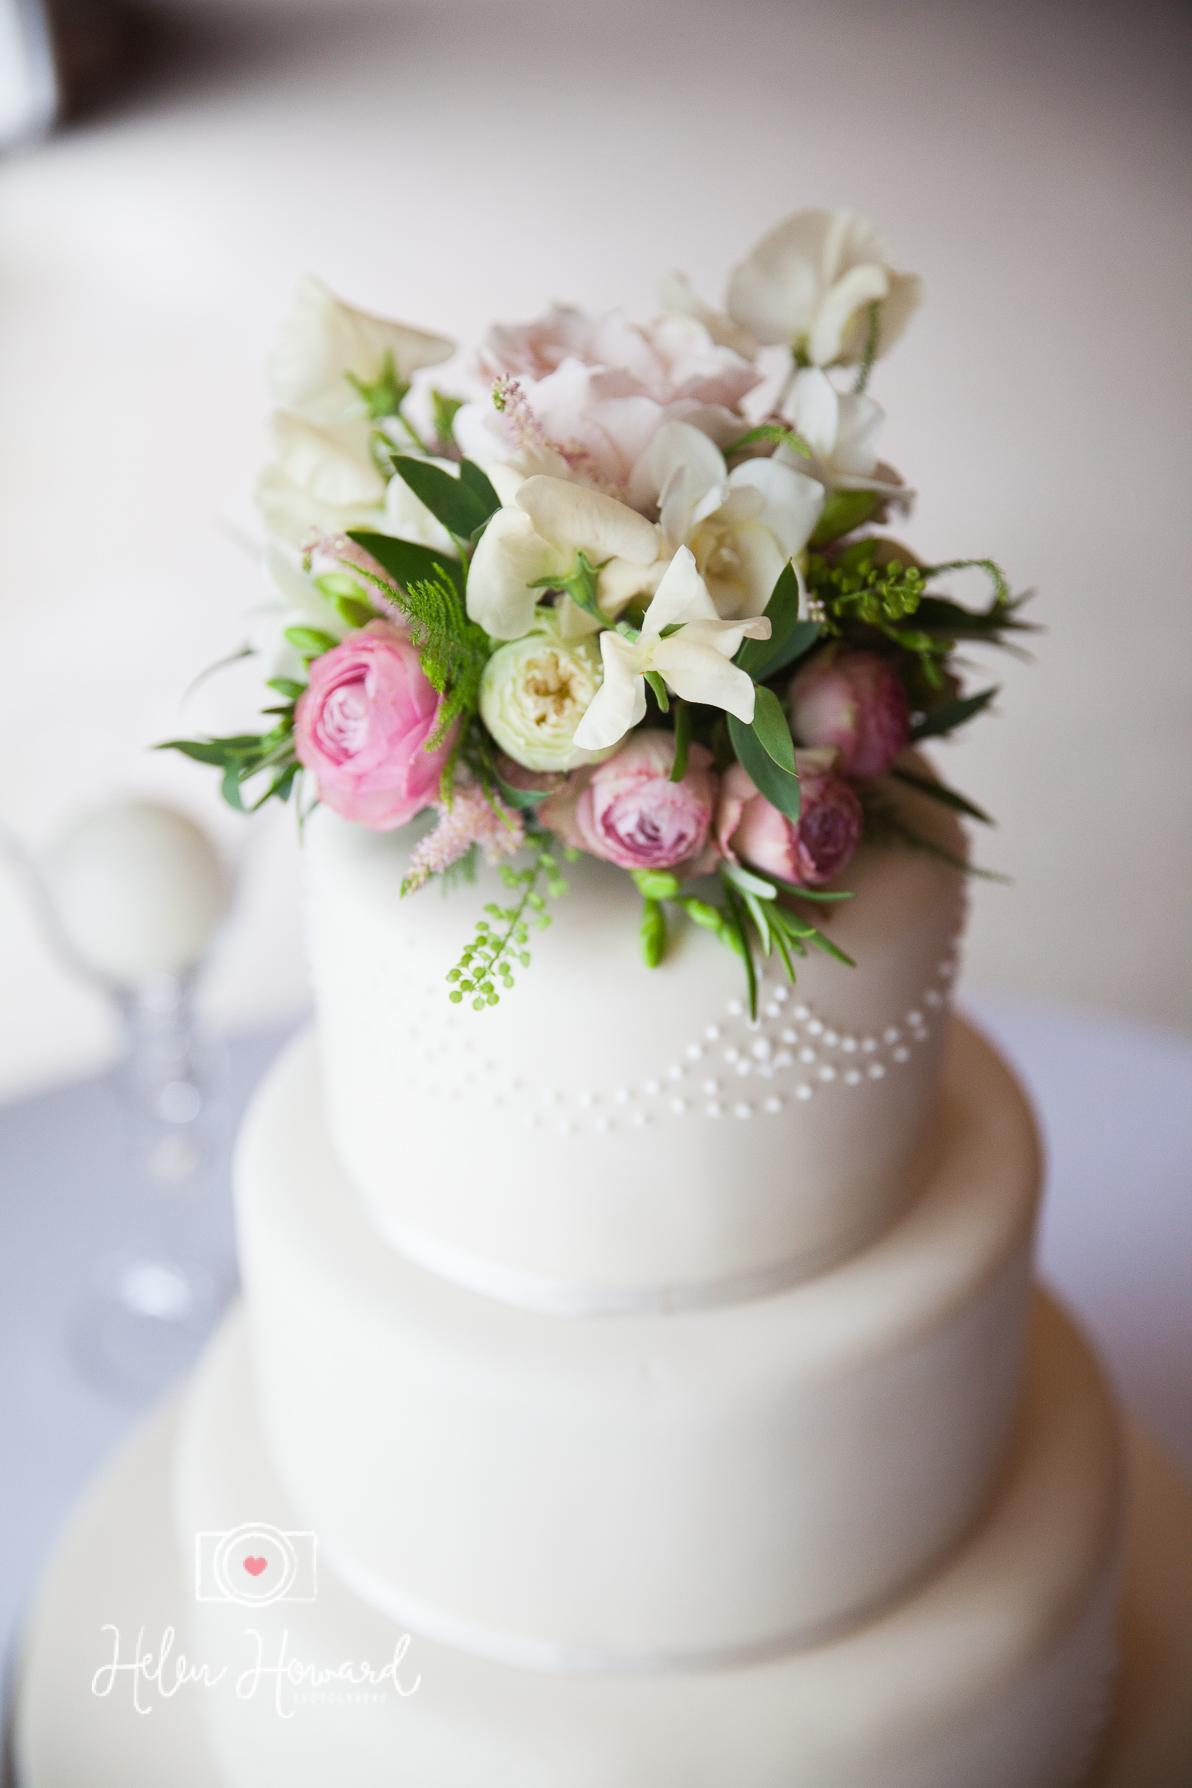 Helen Howard Photography Packington Moor Wedding-25.jpg